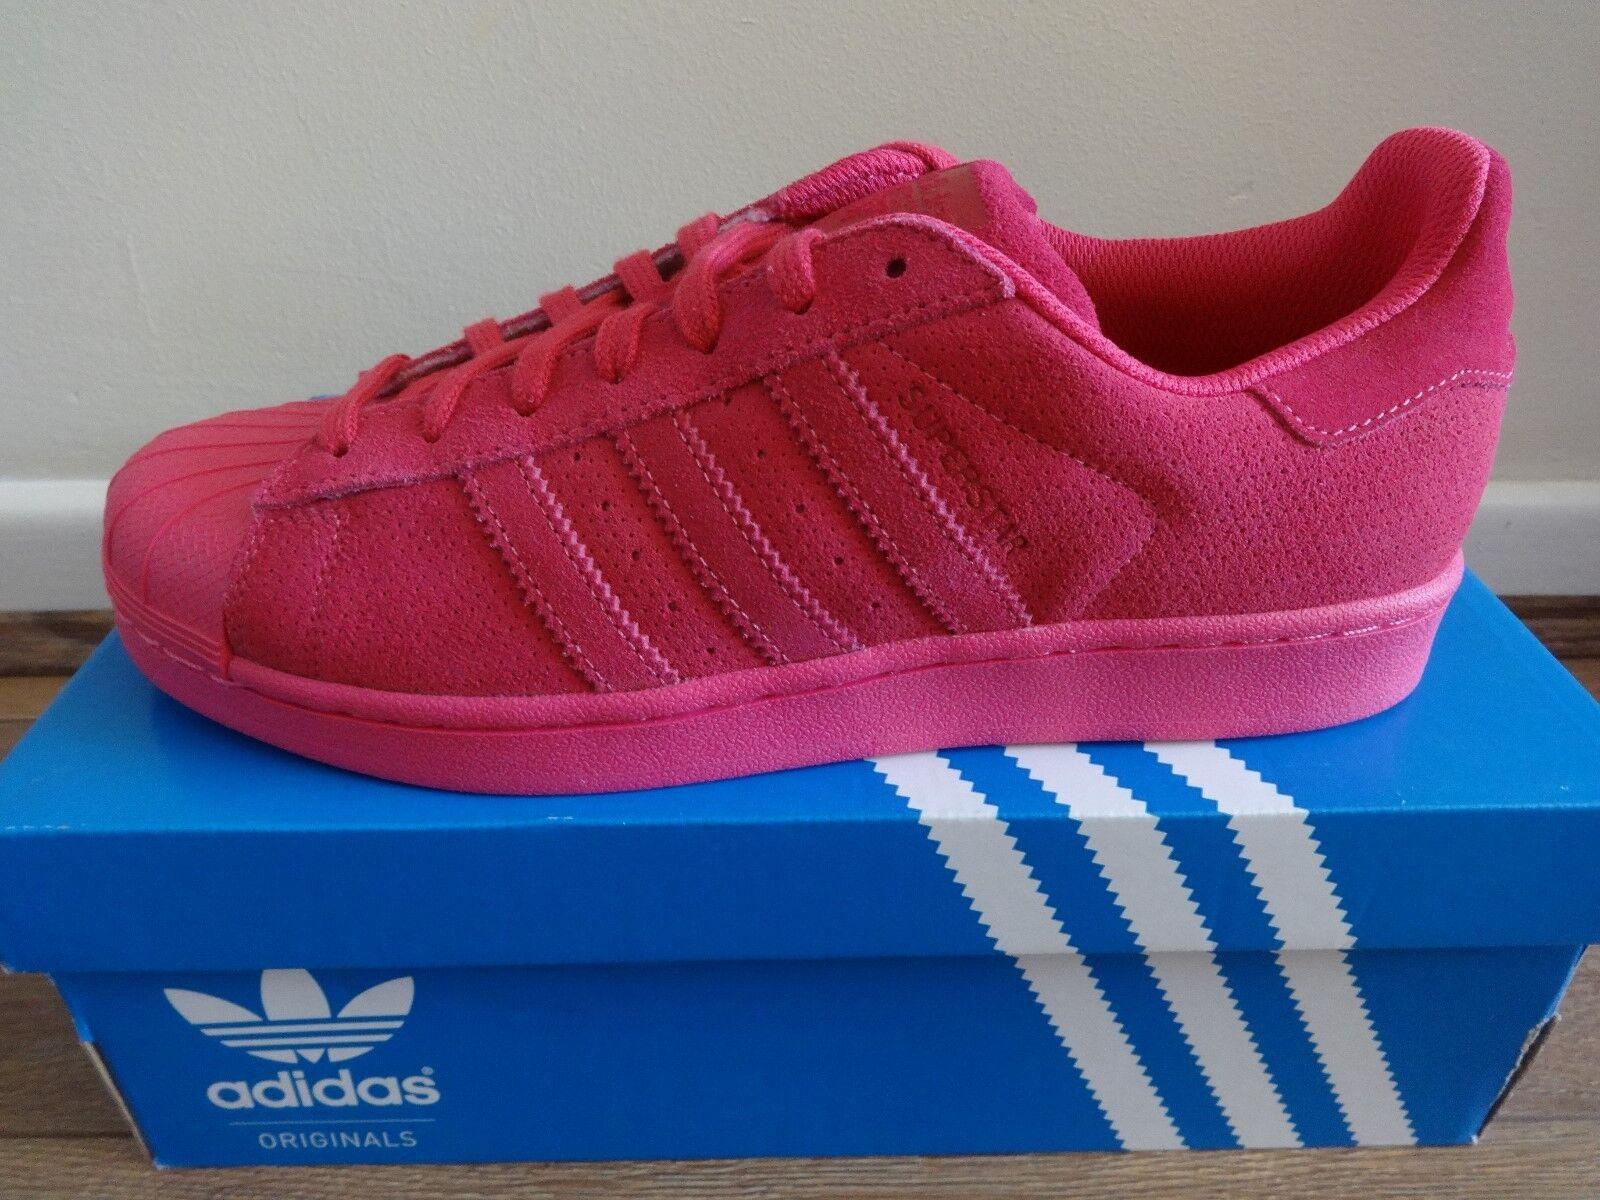 Adidas Originals Superstar RT mens trainers sneakers shoes AQ4166 NEW+BOX